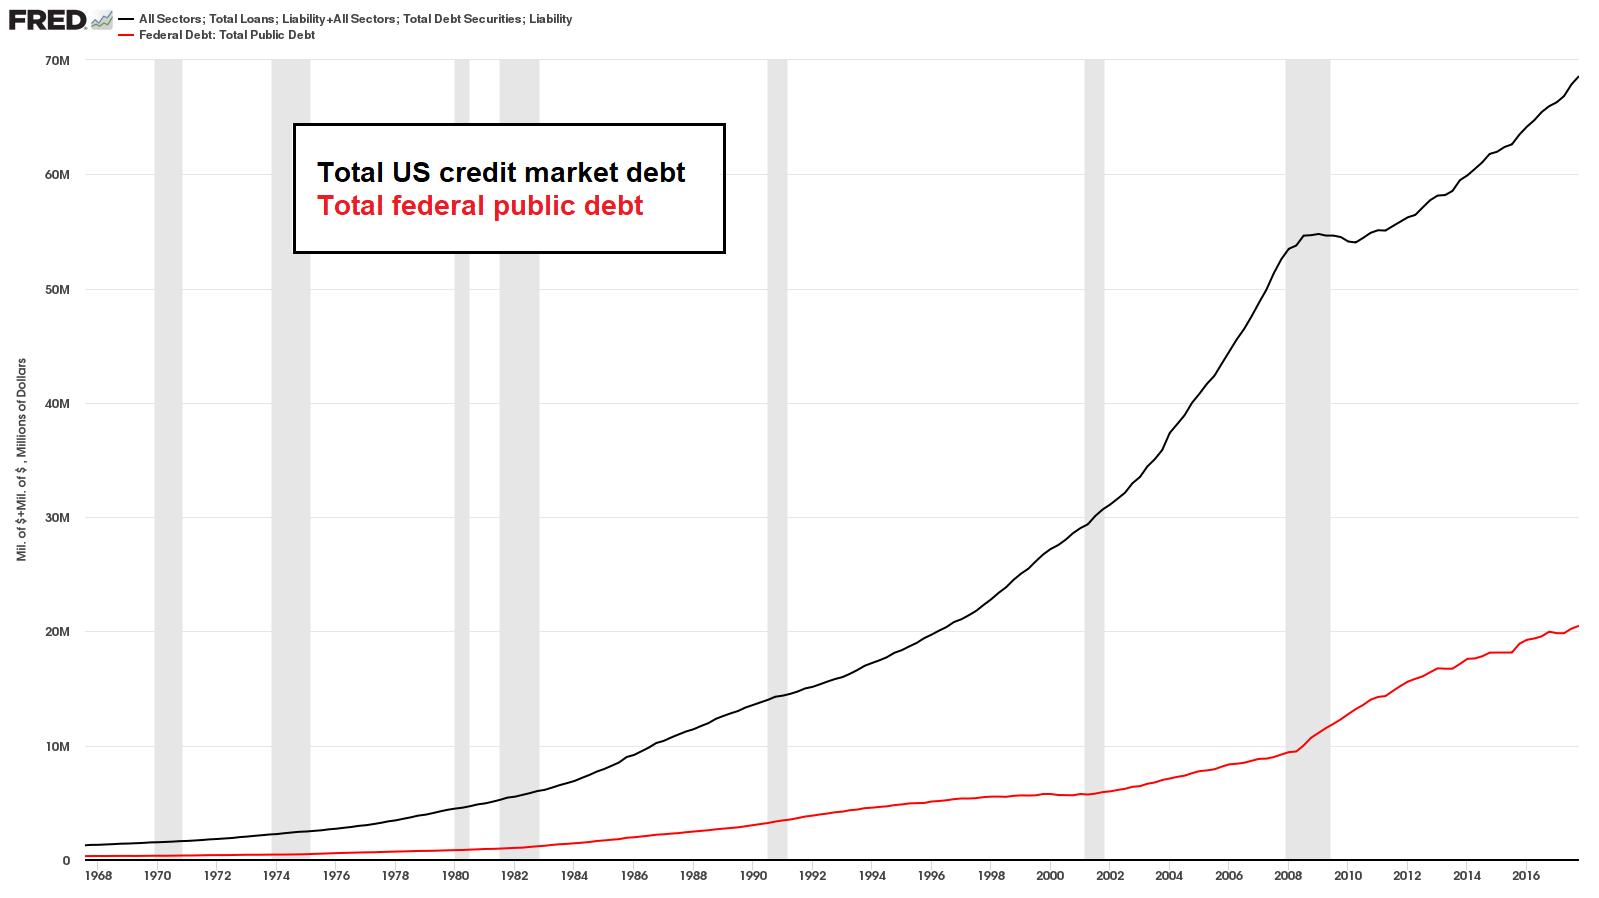 US Total Credit Market Debt, 1968 - 2018